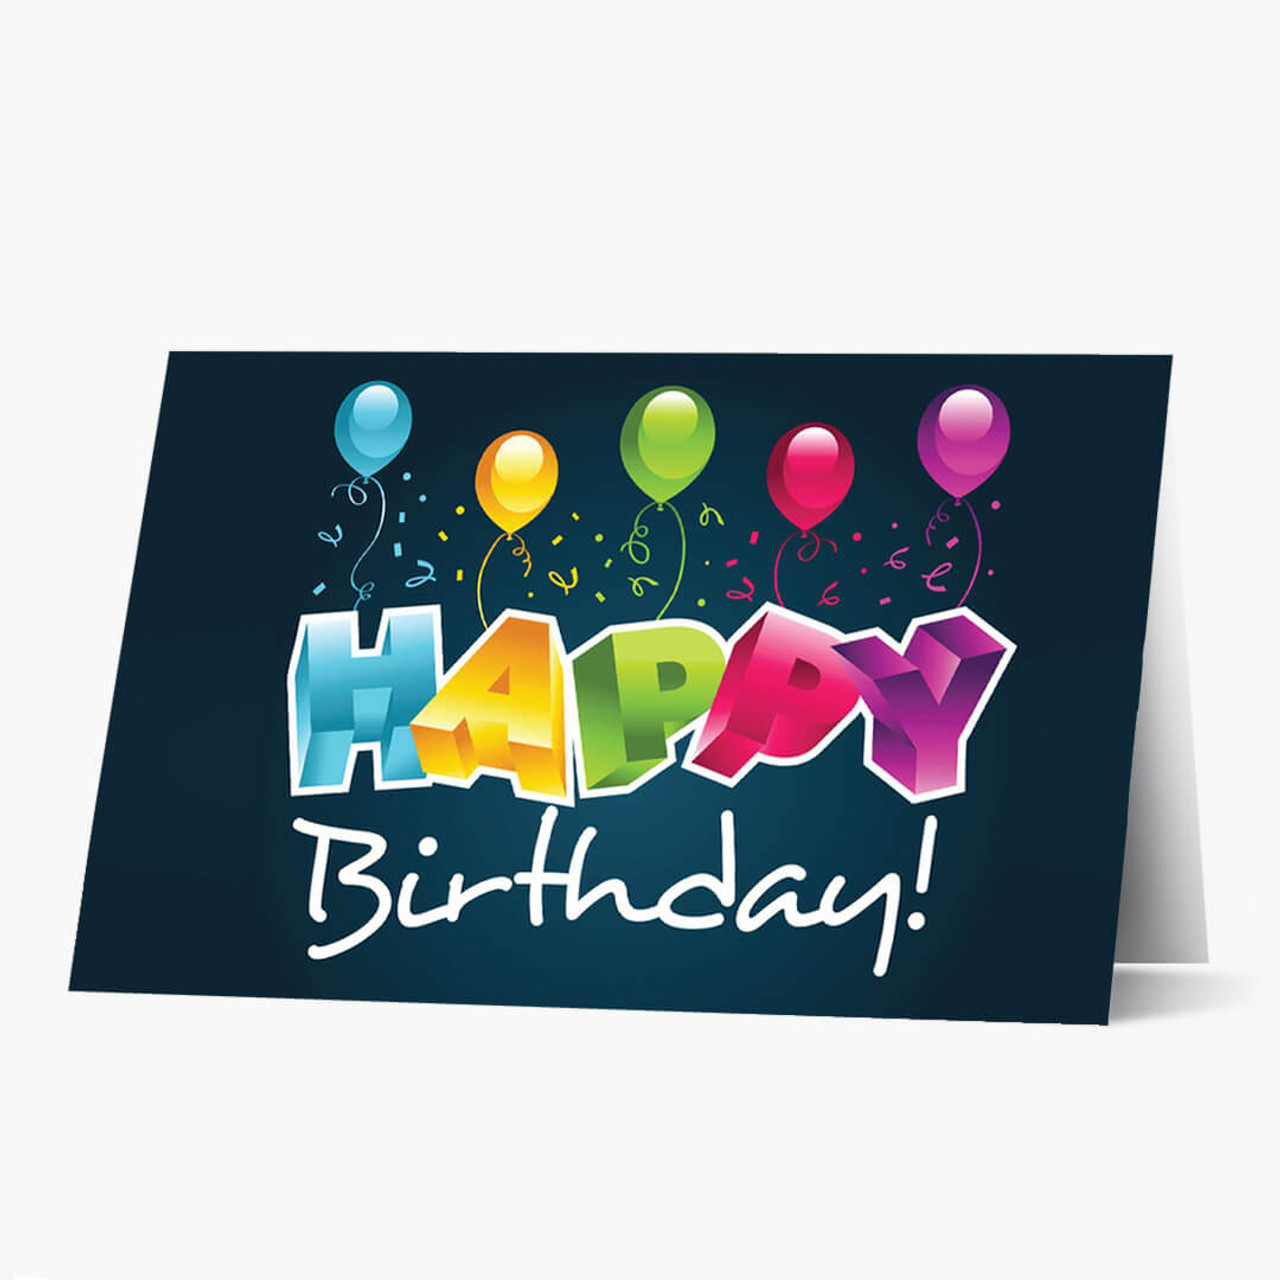 3D Birthday Greeting Card